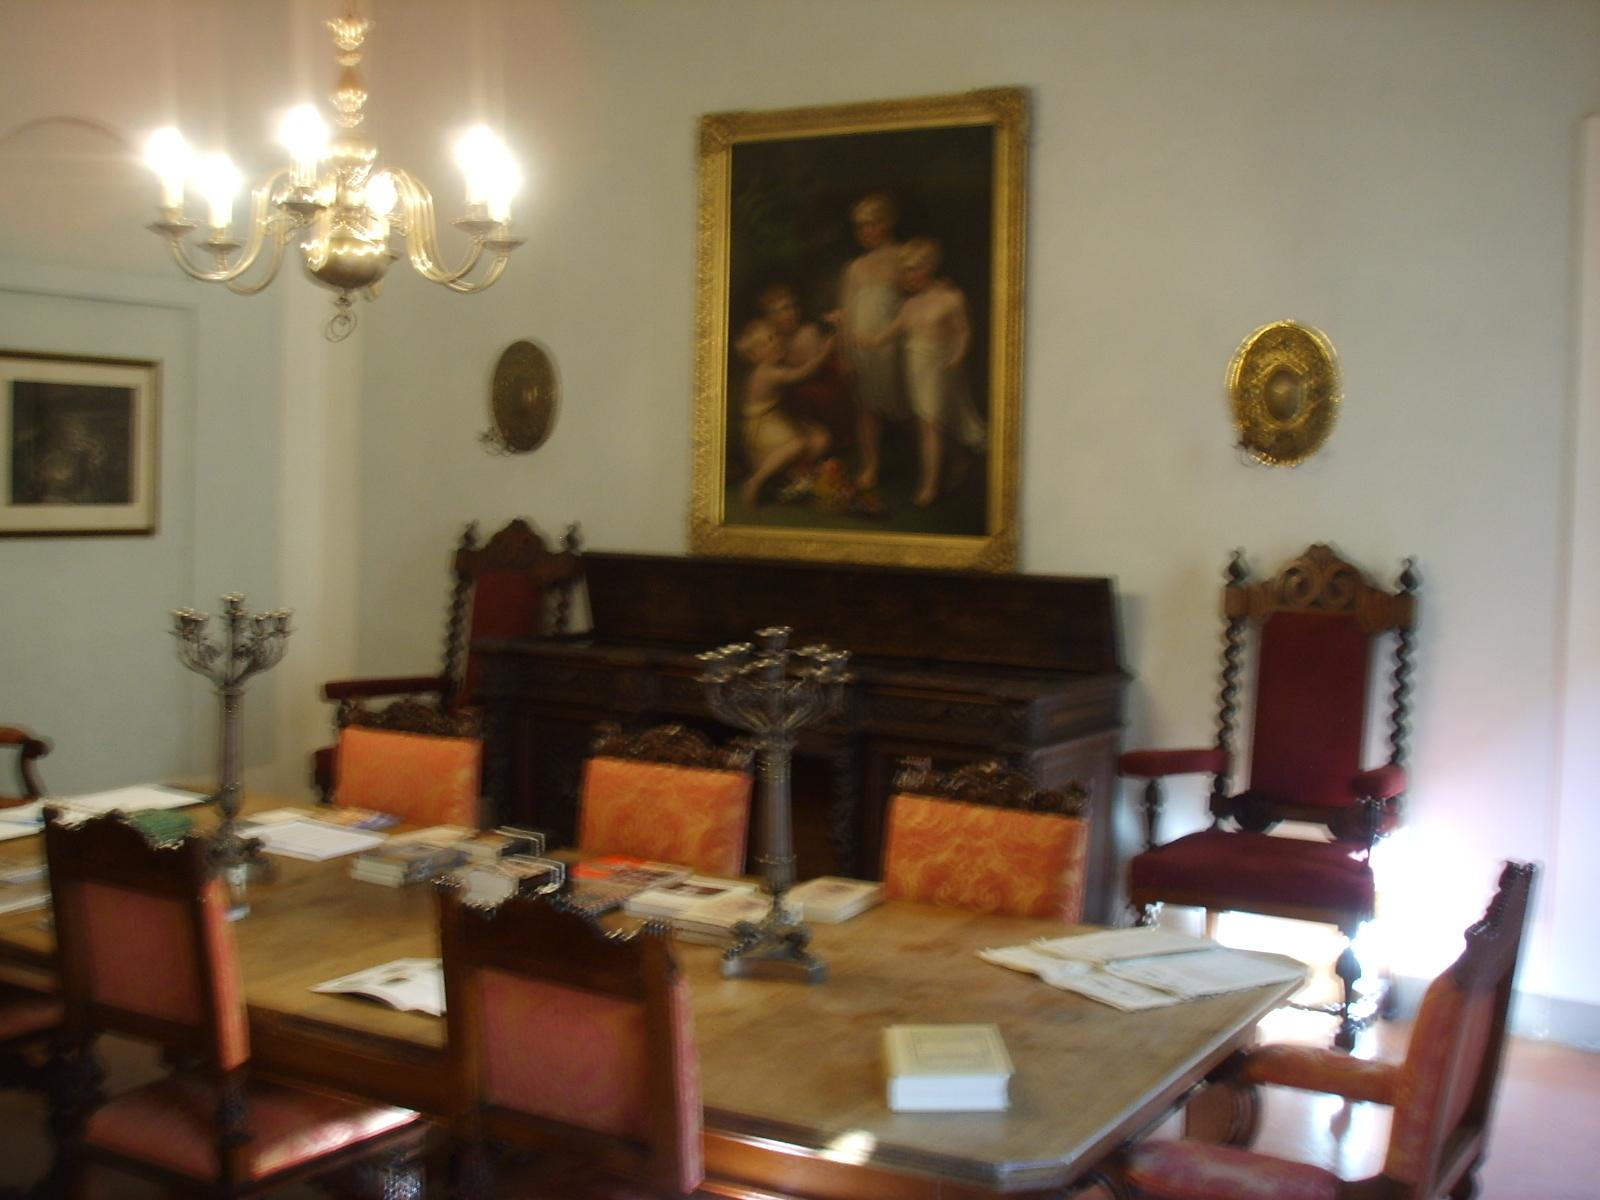 File:Casa Guidi Sala Da Pranzo.JPG Wikimedia Commons #A15D2A 1600 1200 Sala Da Pranzo Country Chic